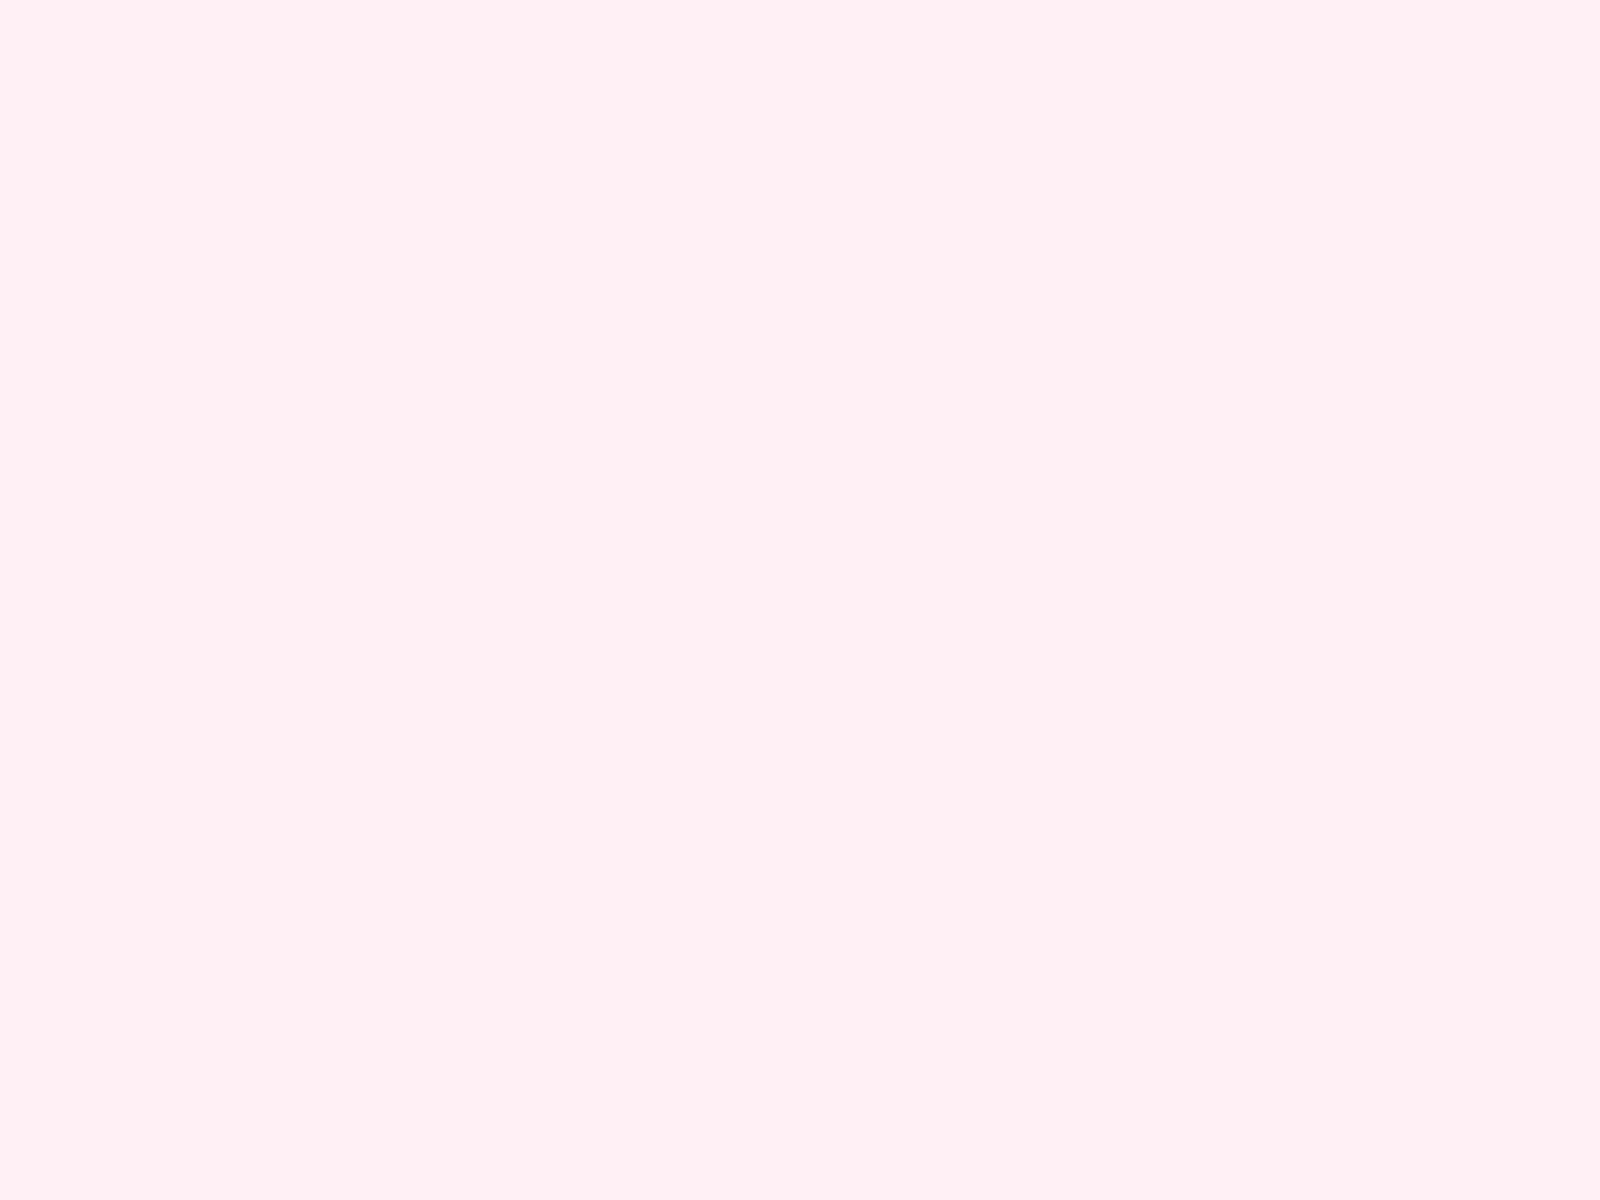 1600x1200 Lavender Blush Solid Color Background